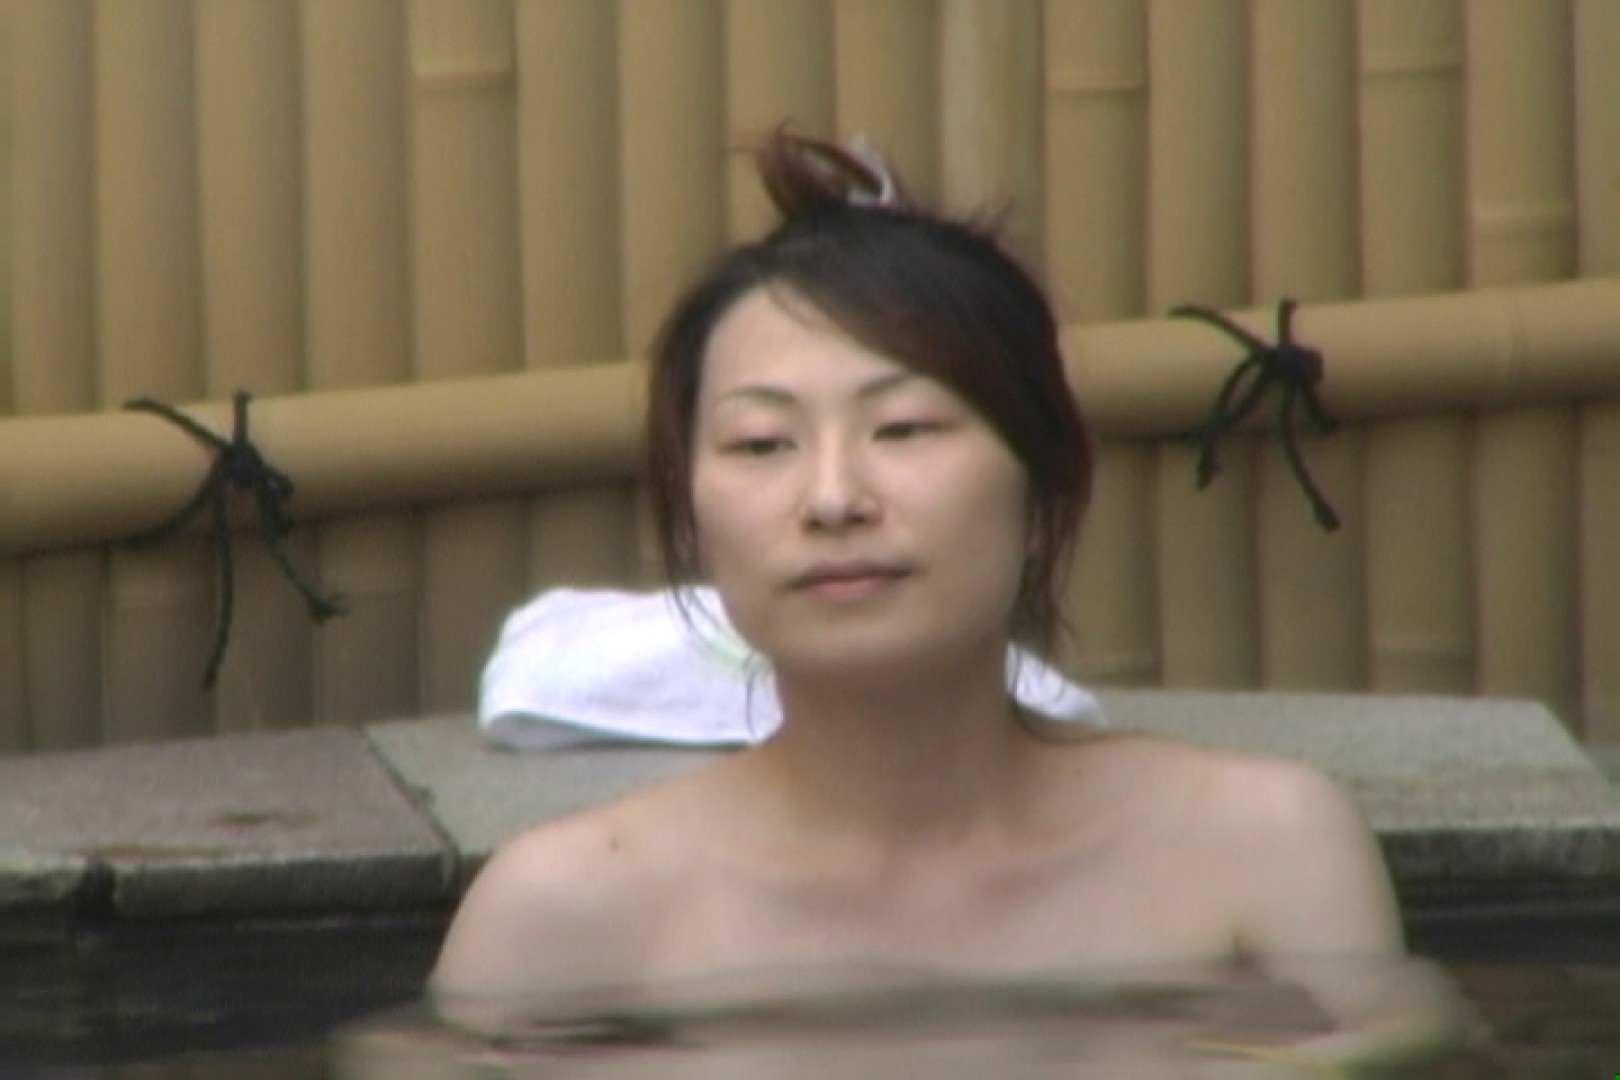 Aquaな露天風呂Vol.615 0  36連発 4